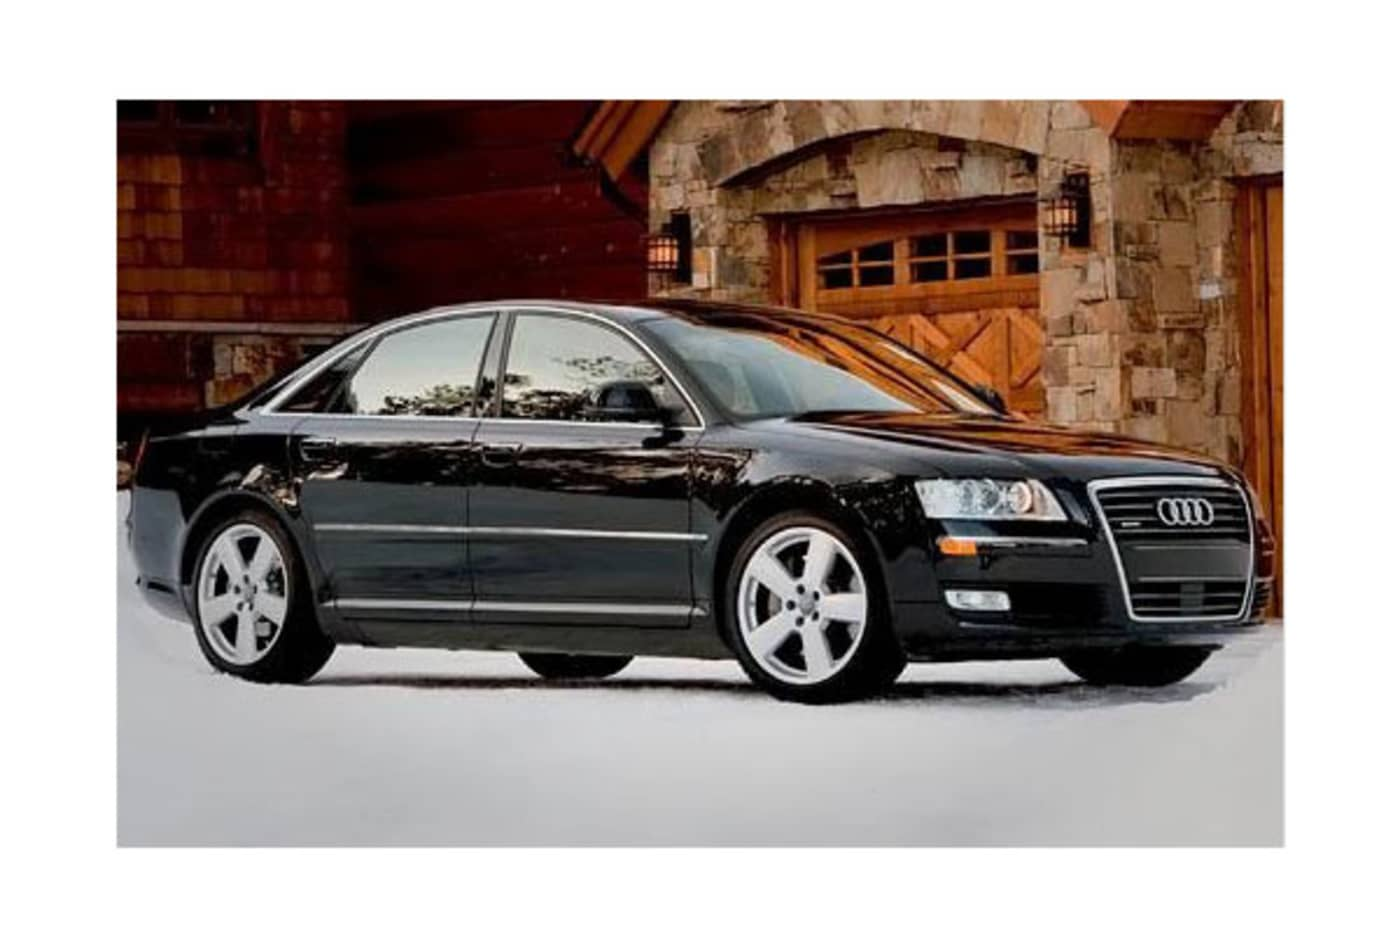 Audi-A8-Most-Stolen-Luxury-Cars-CNBC.jpg